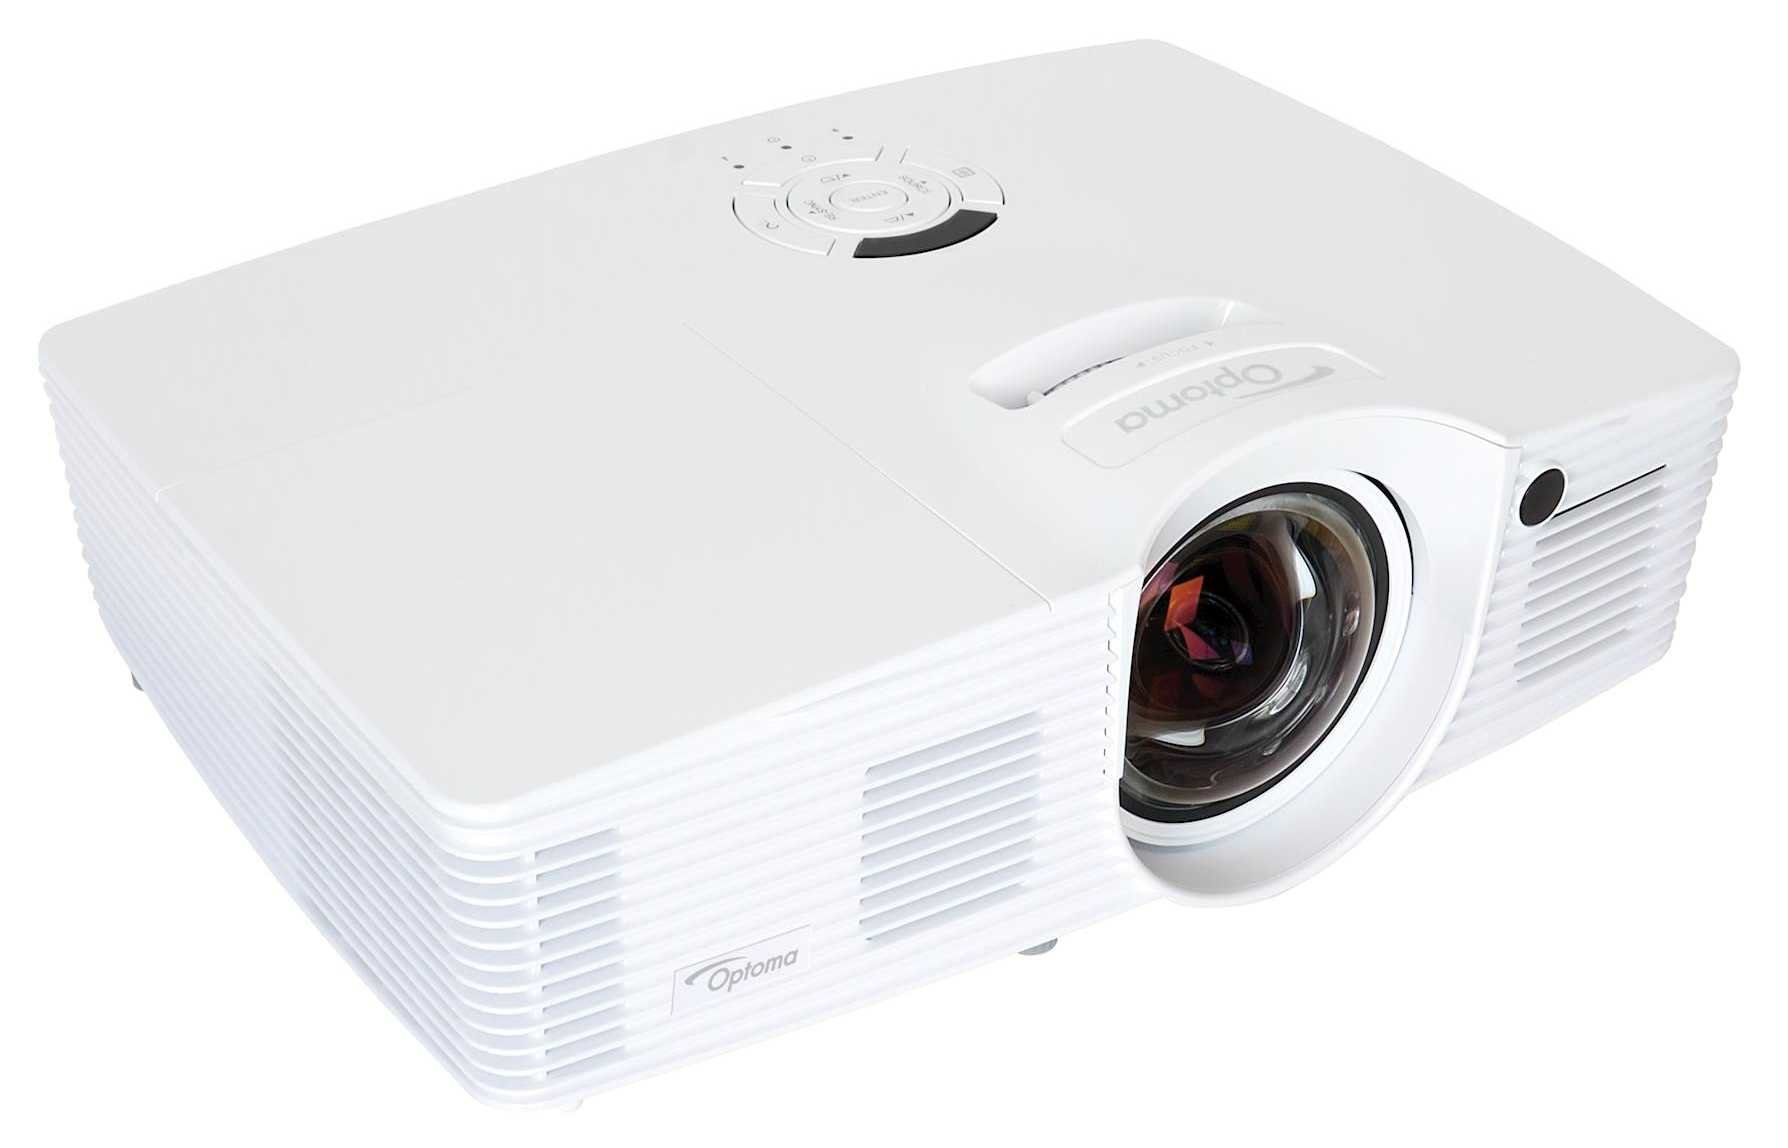 Projektor OPTOMA GT1080E - Krótki rzut